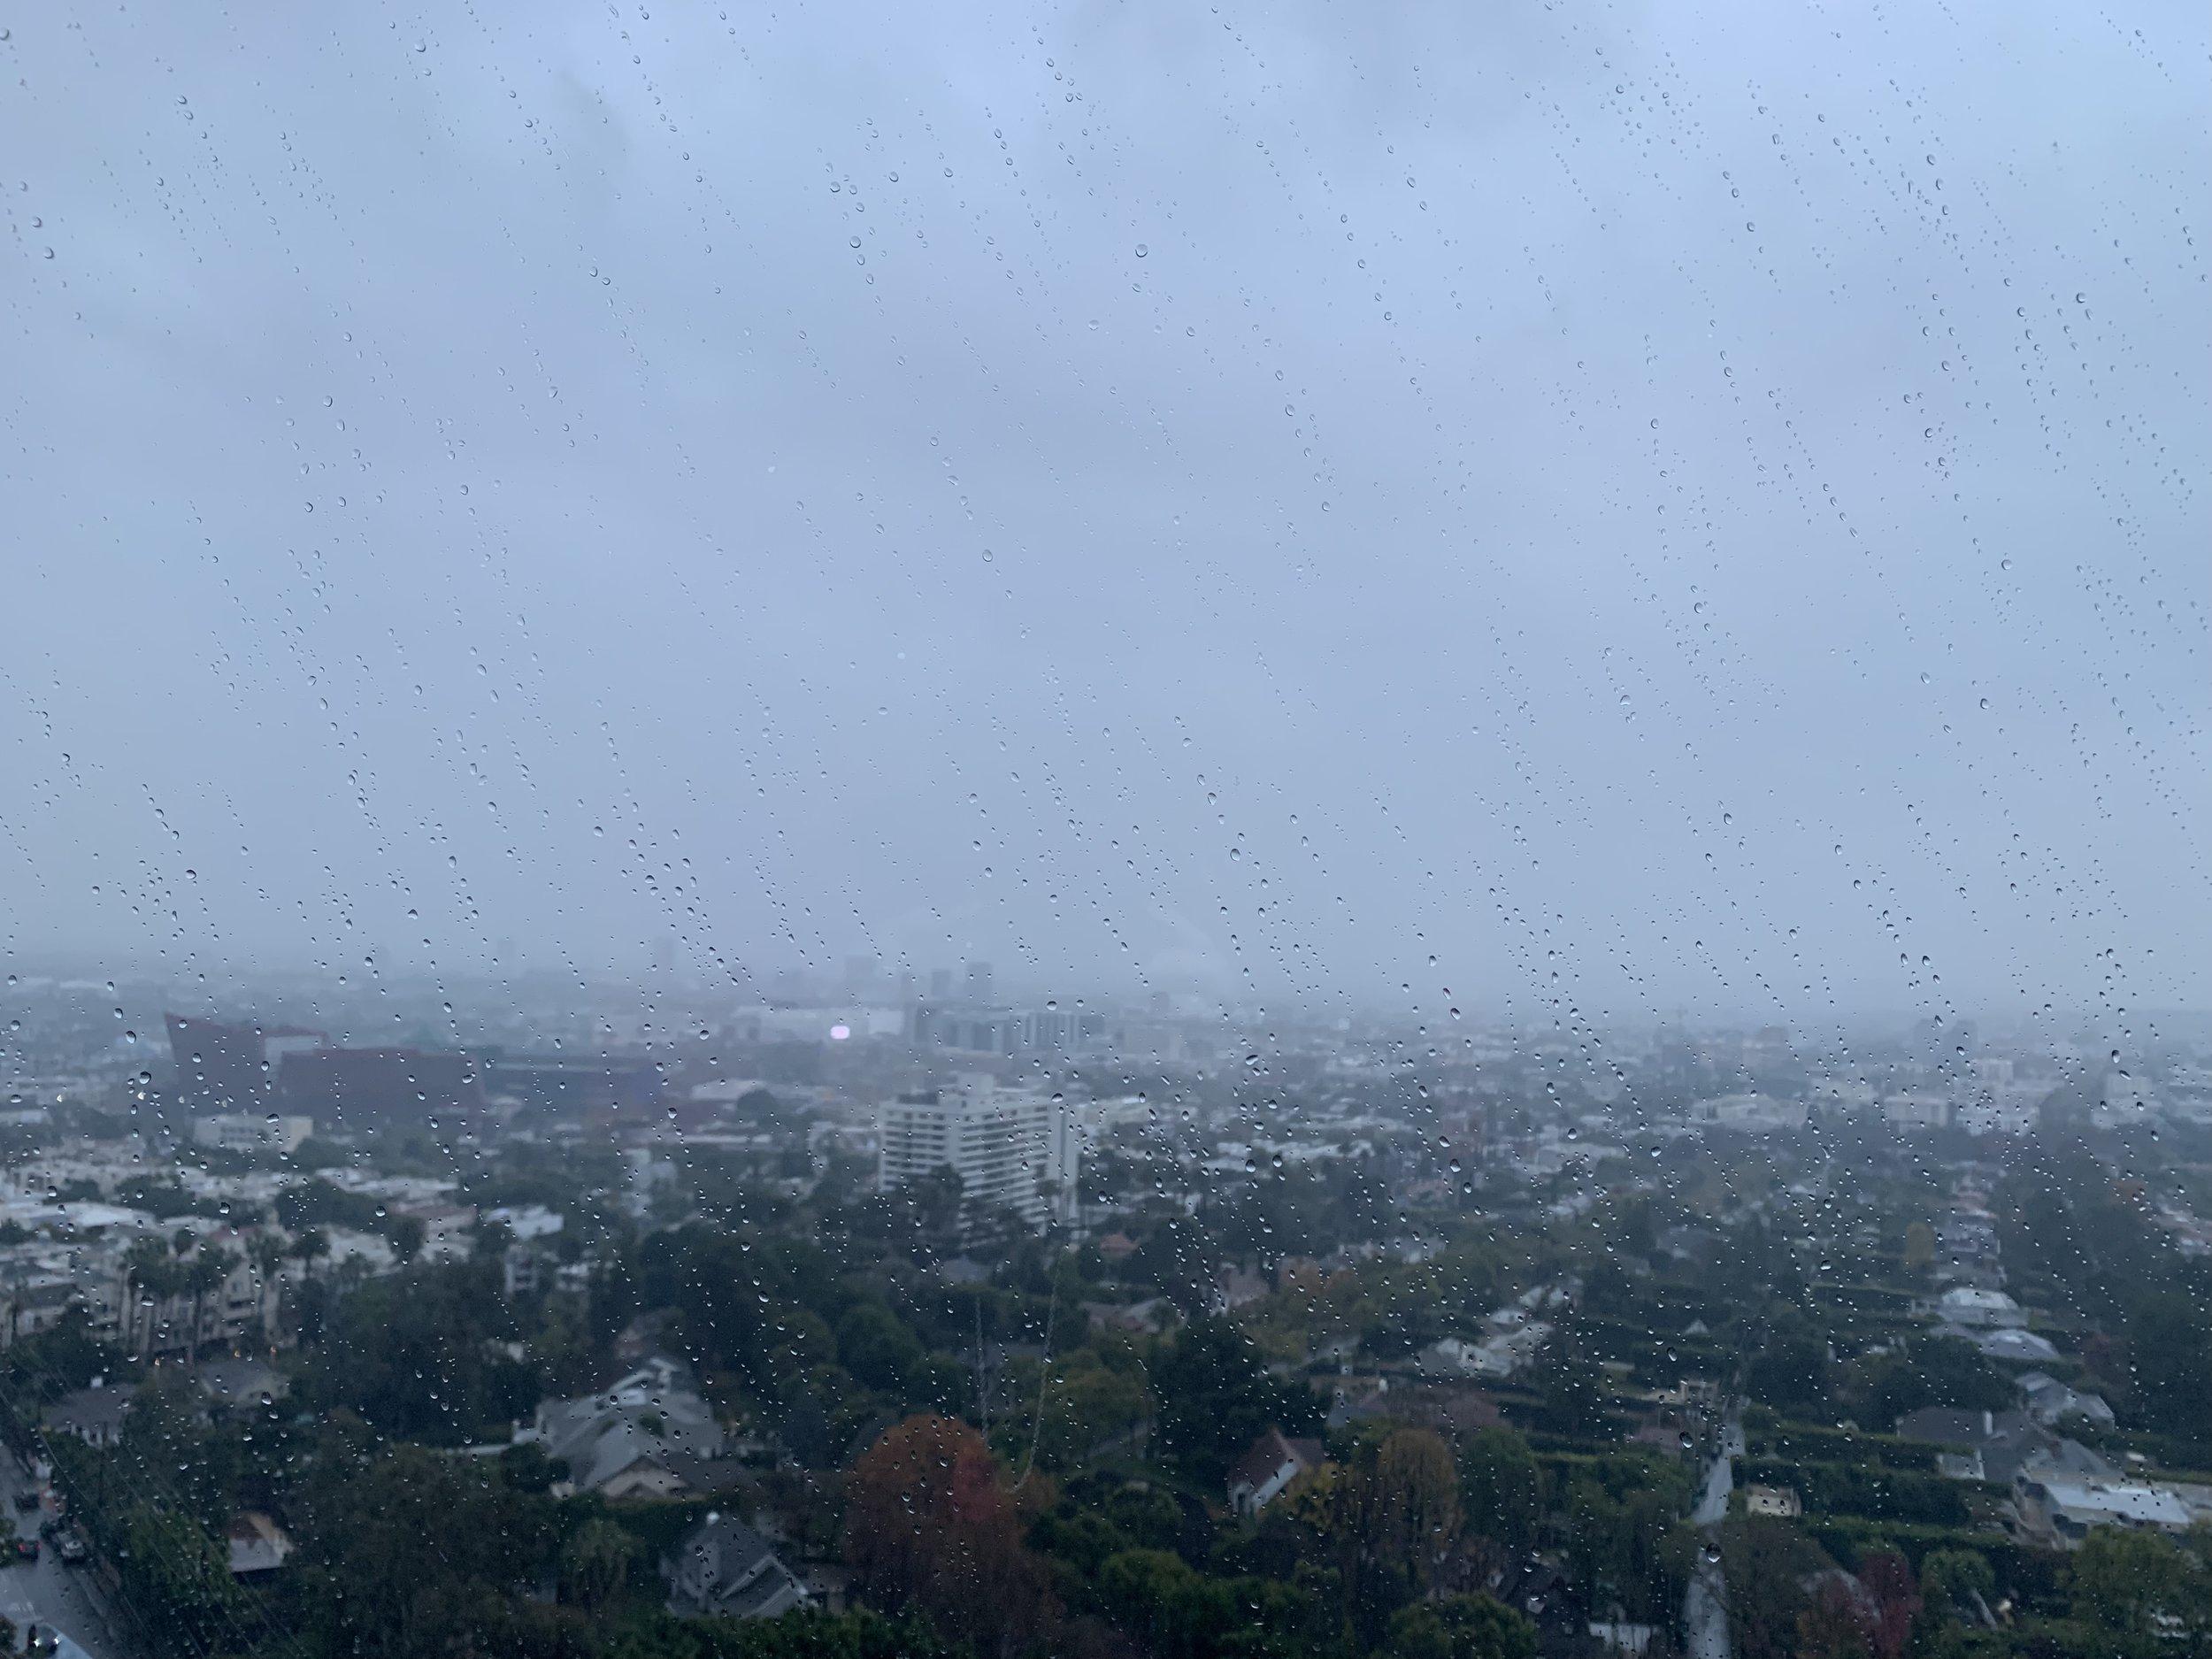 LA through the rain